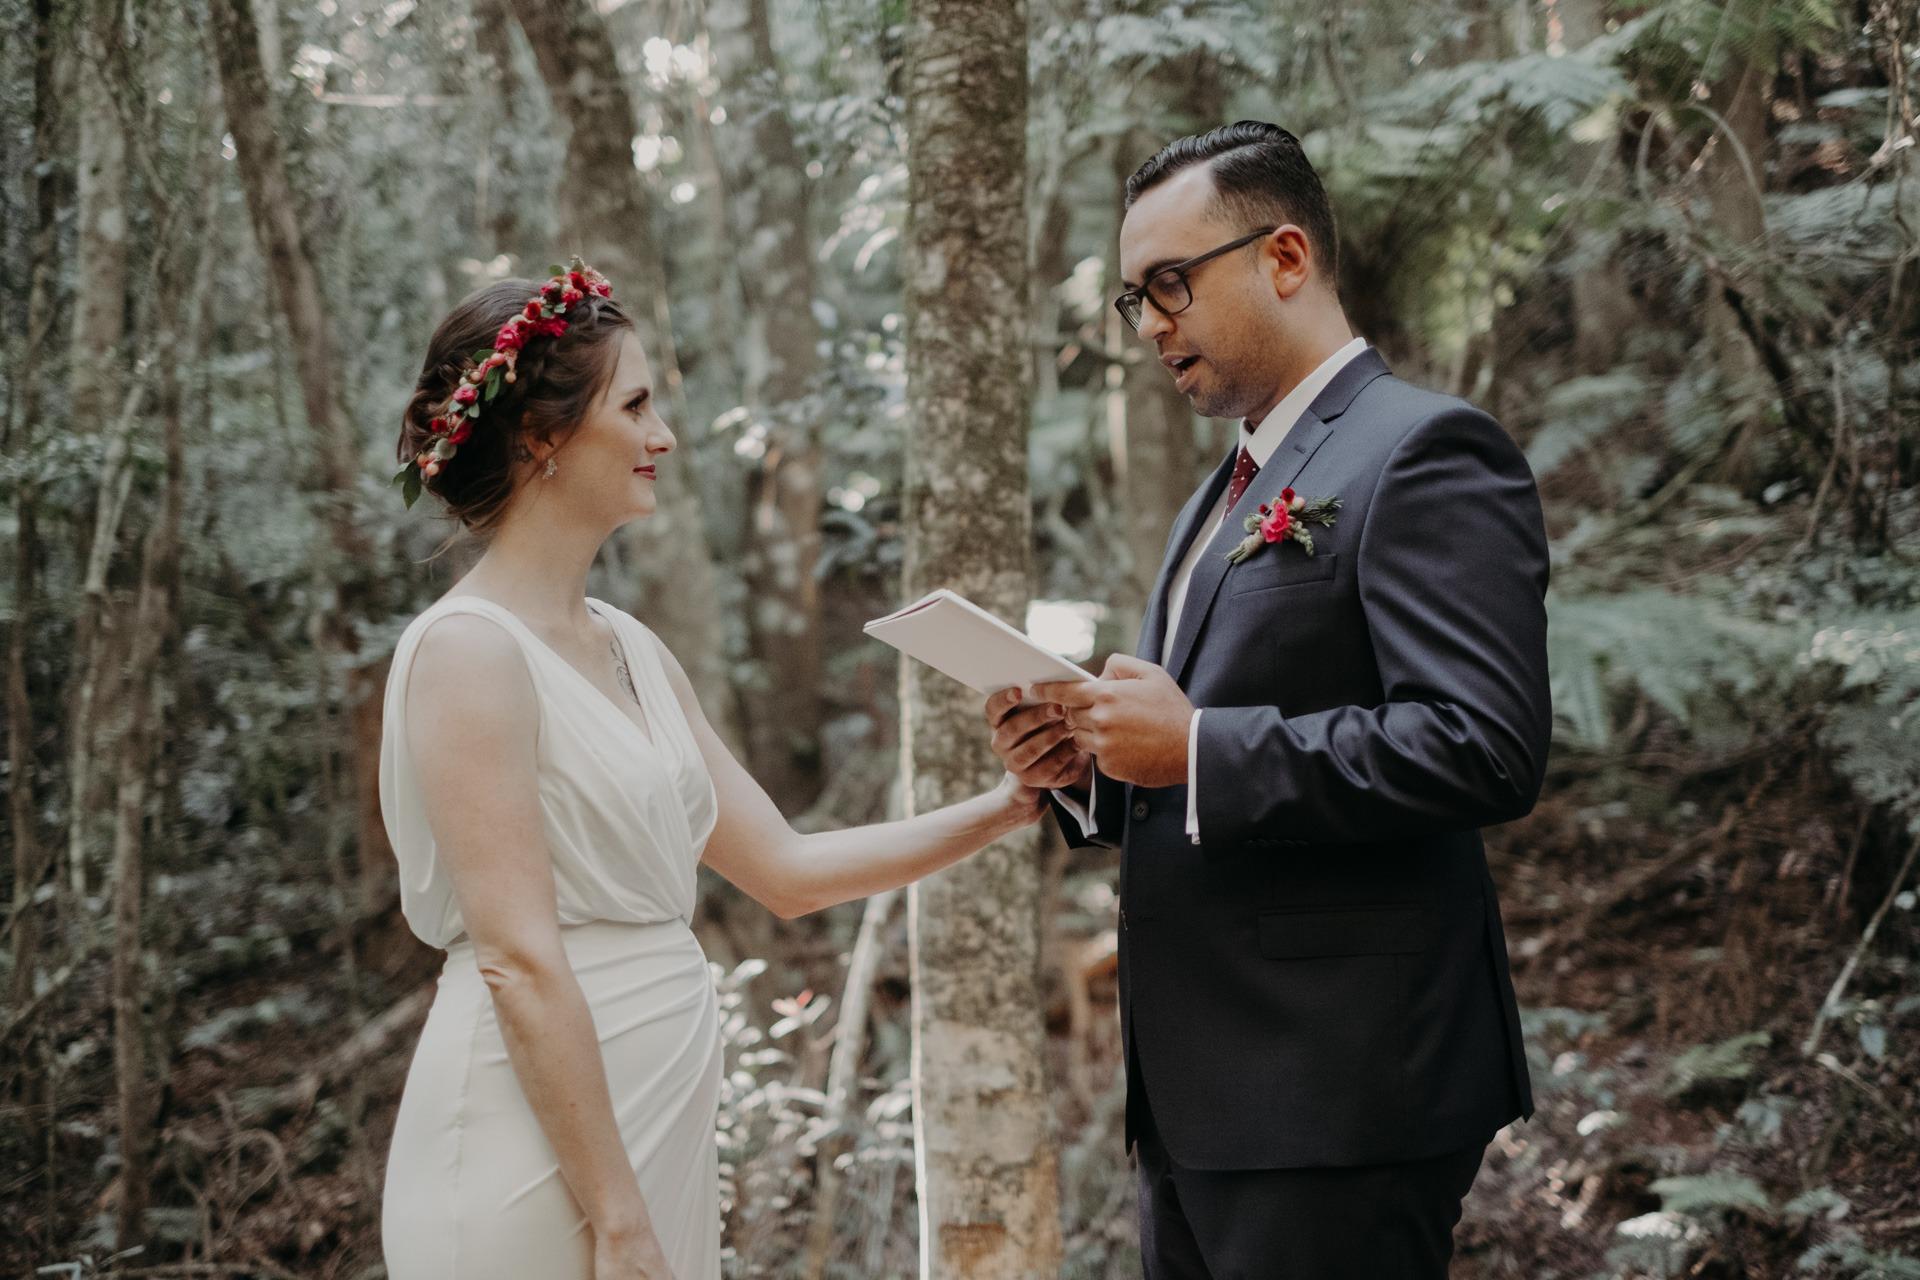 bride and groom vows forest elopement oreillys mountain rainforest retreat